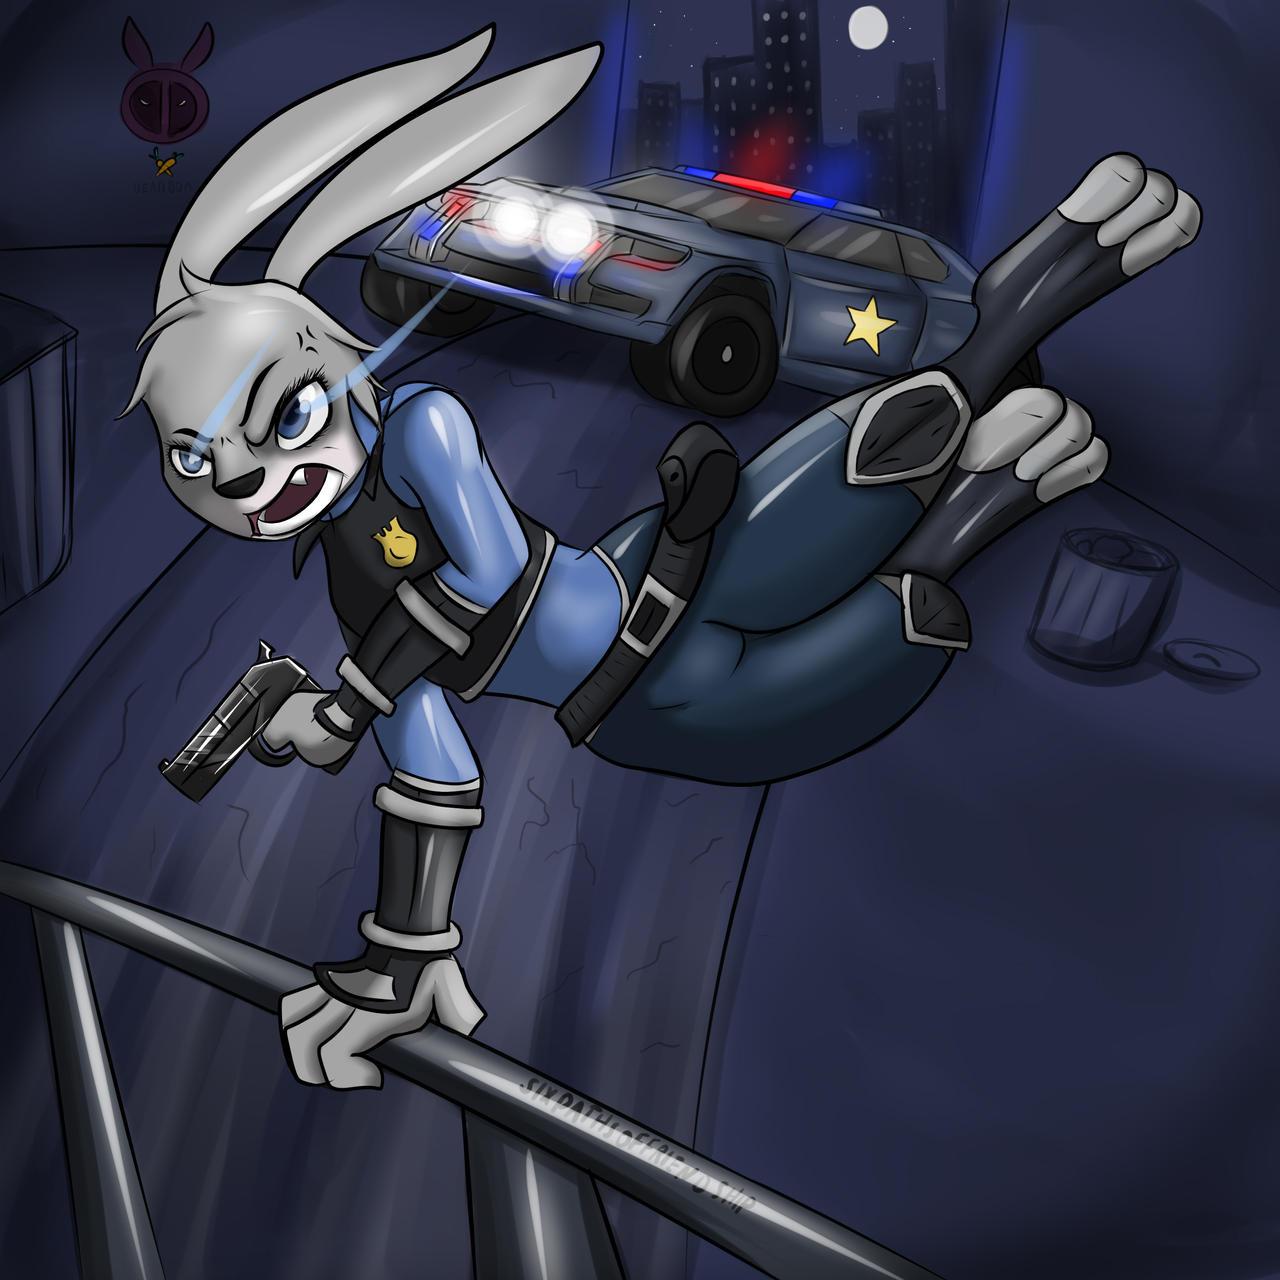 Judy Hopps by sixpathsoffriendship